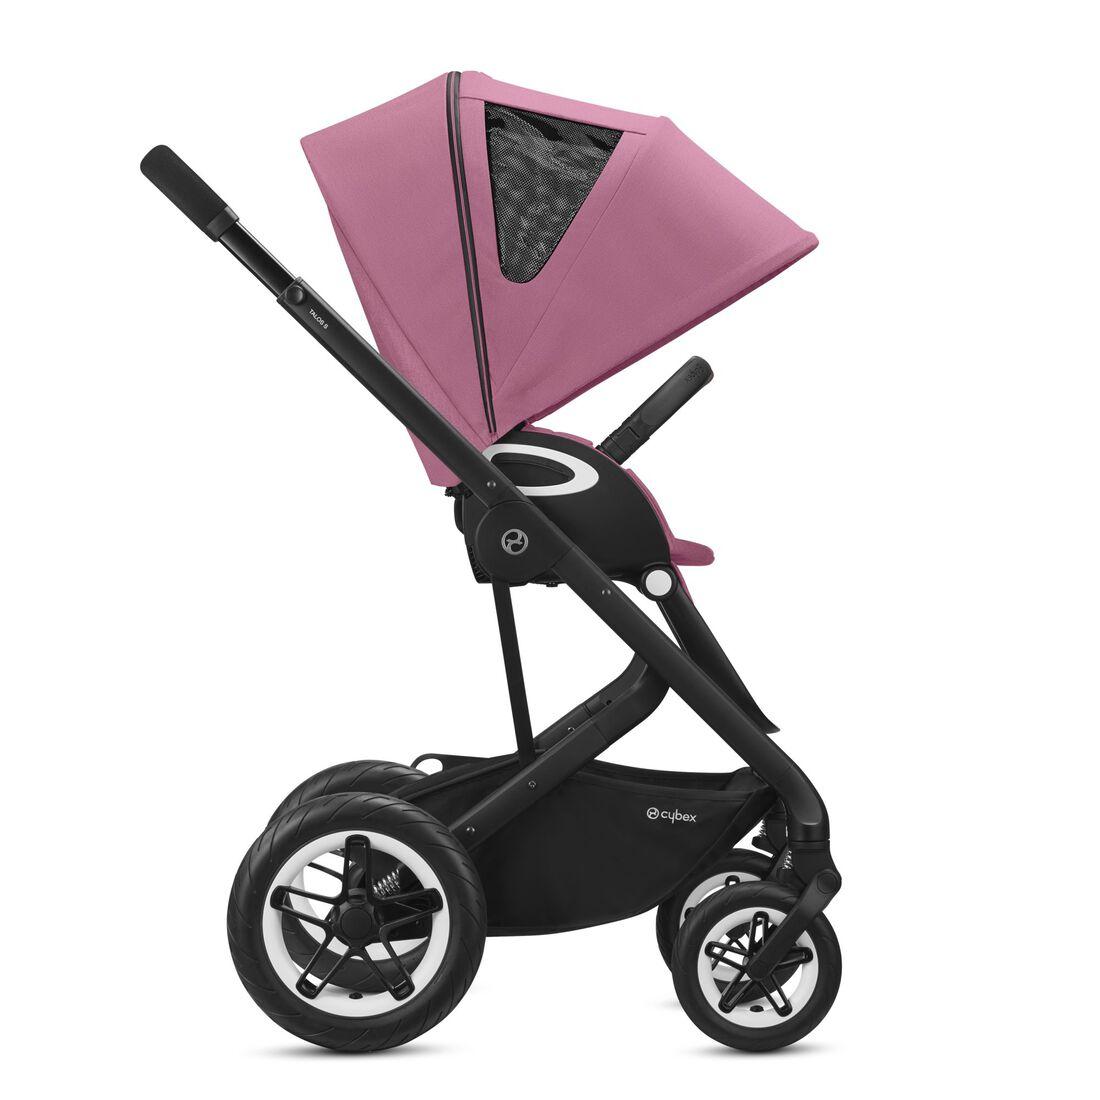 CYBEX Talos S Lux - Magnolia Pink (Black Frame) in Magnolia Pink (Black Frame) large image number 3